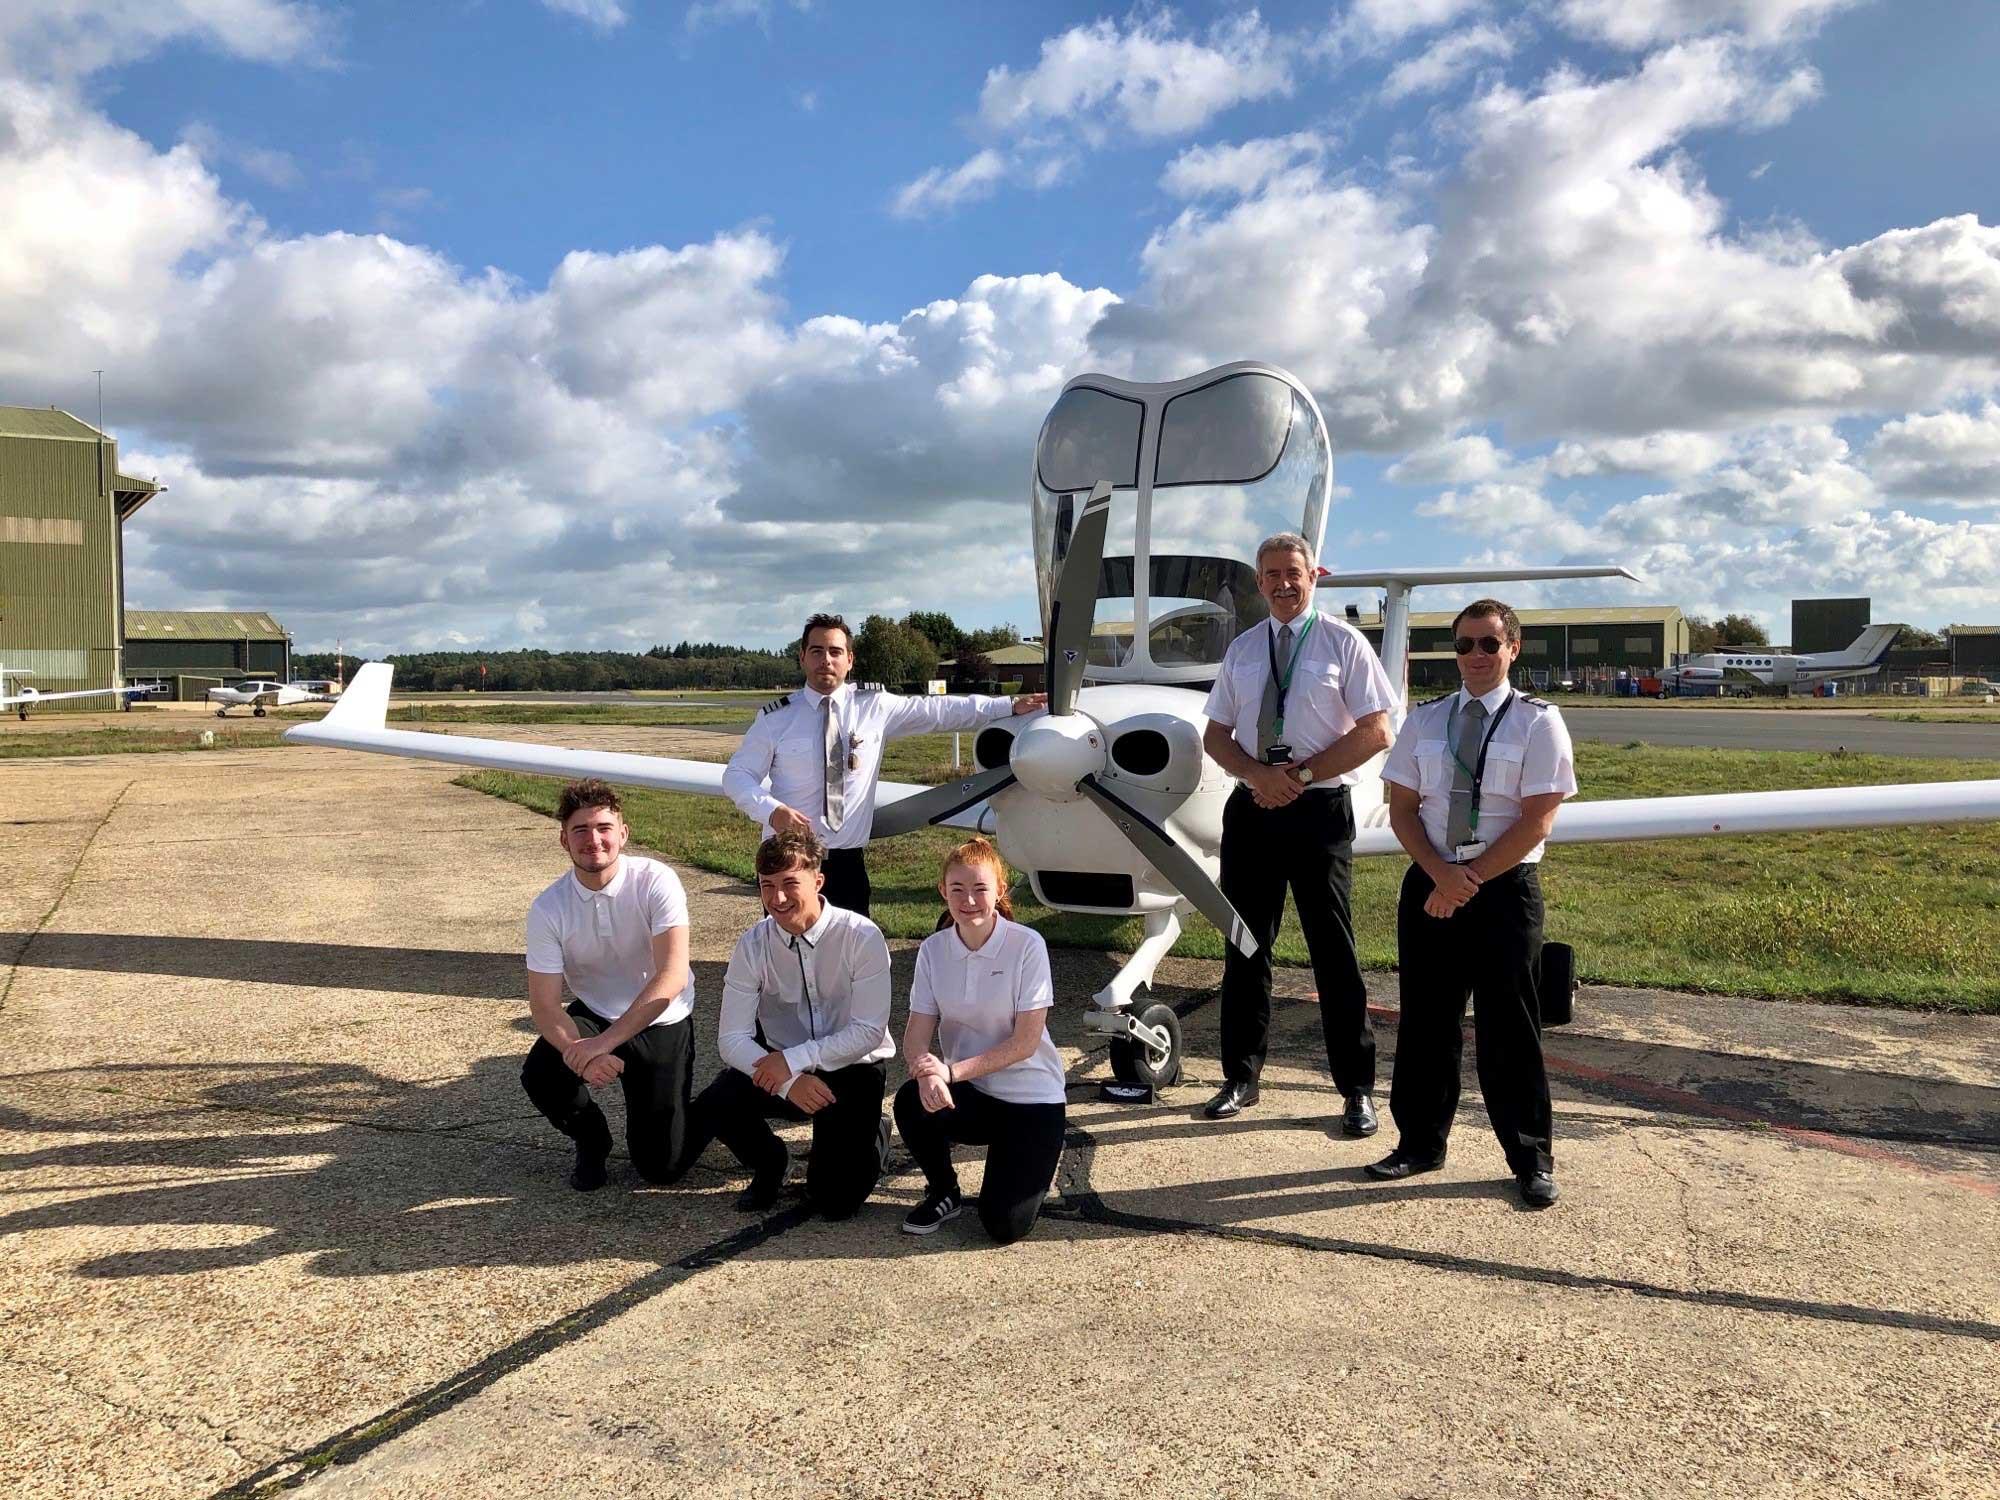 Princes Trust flying scholarships